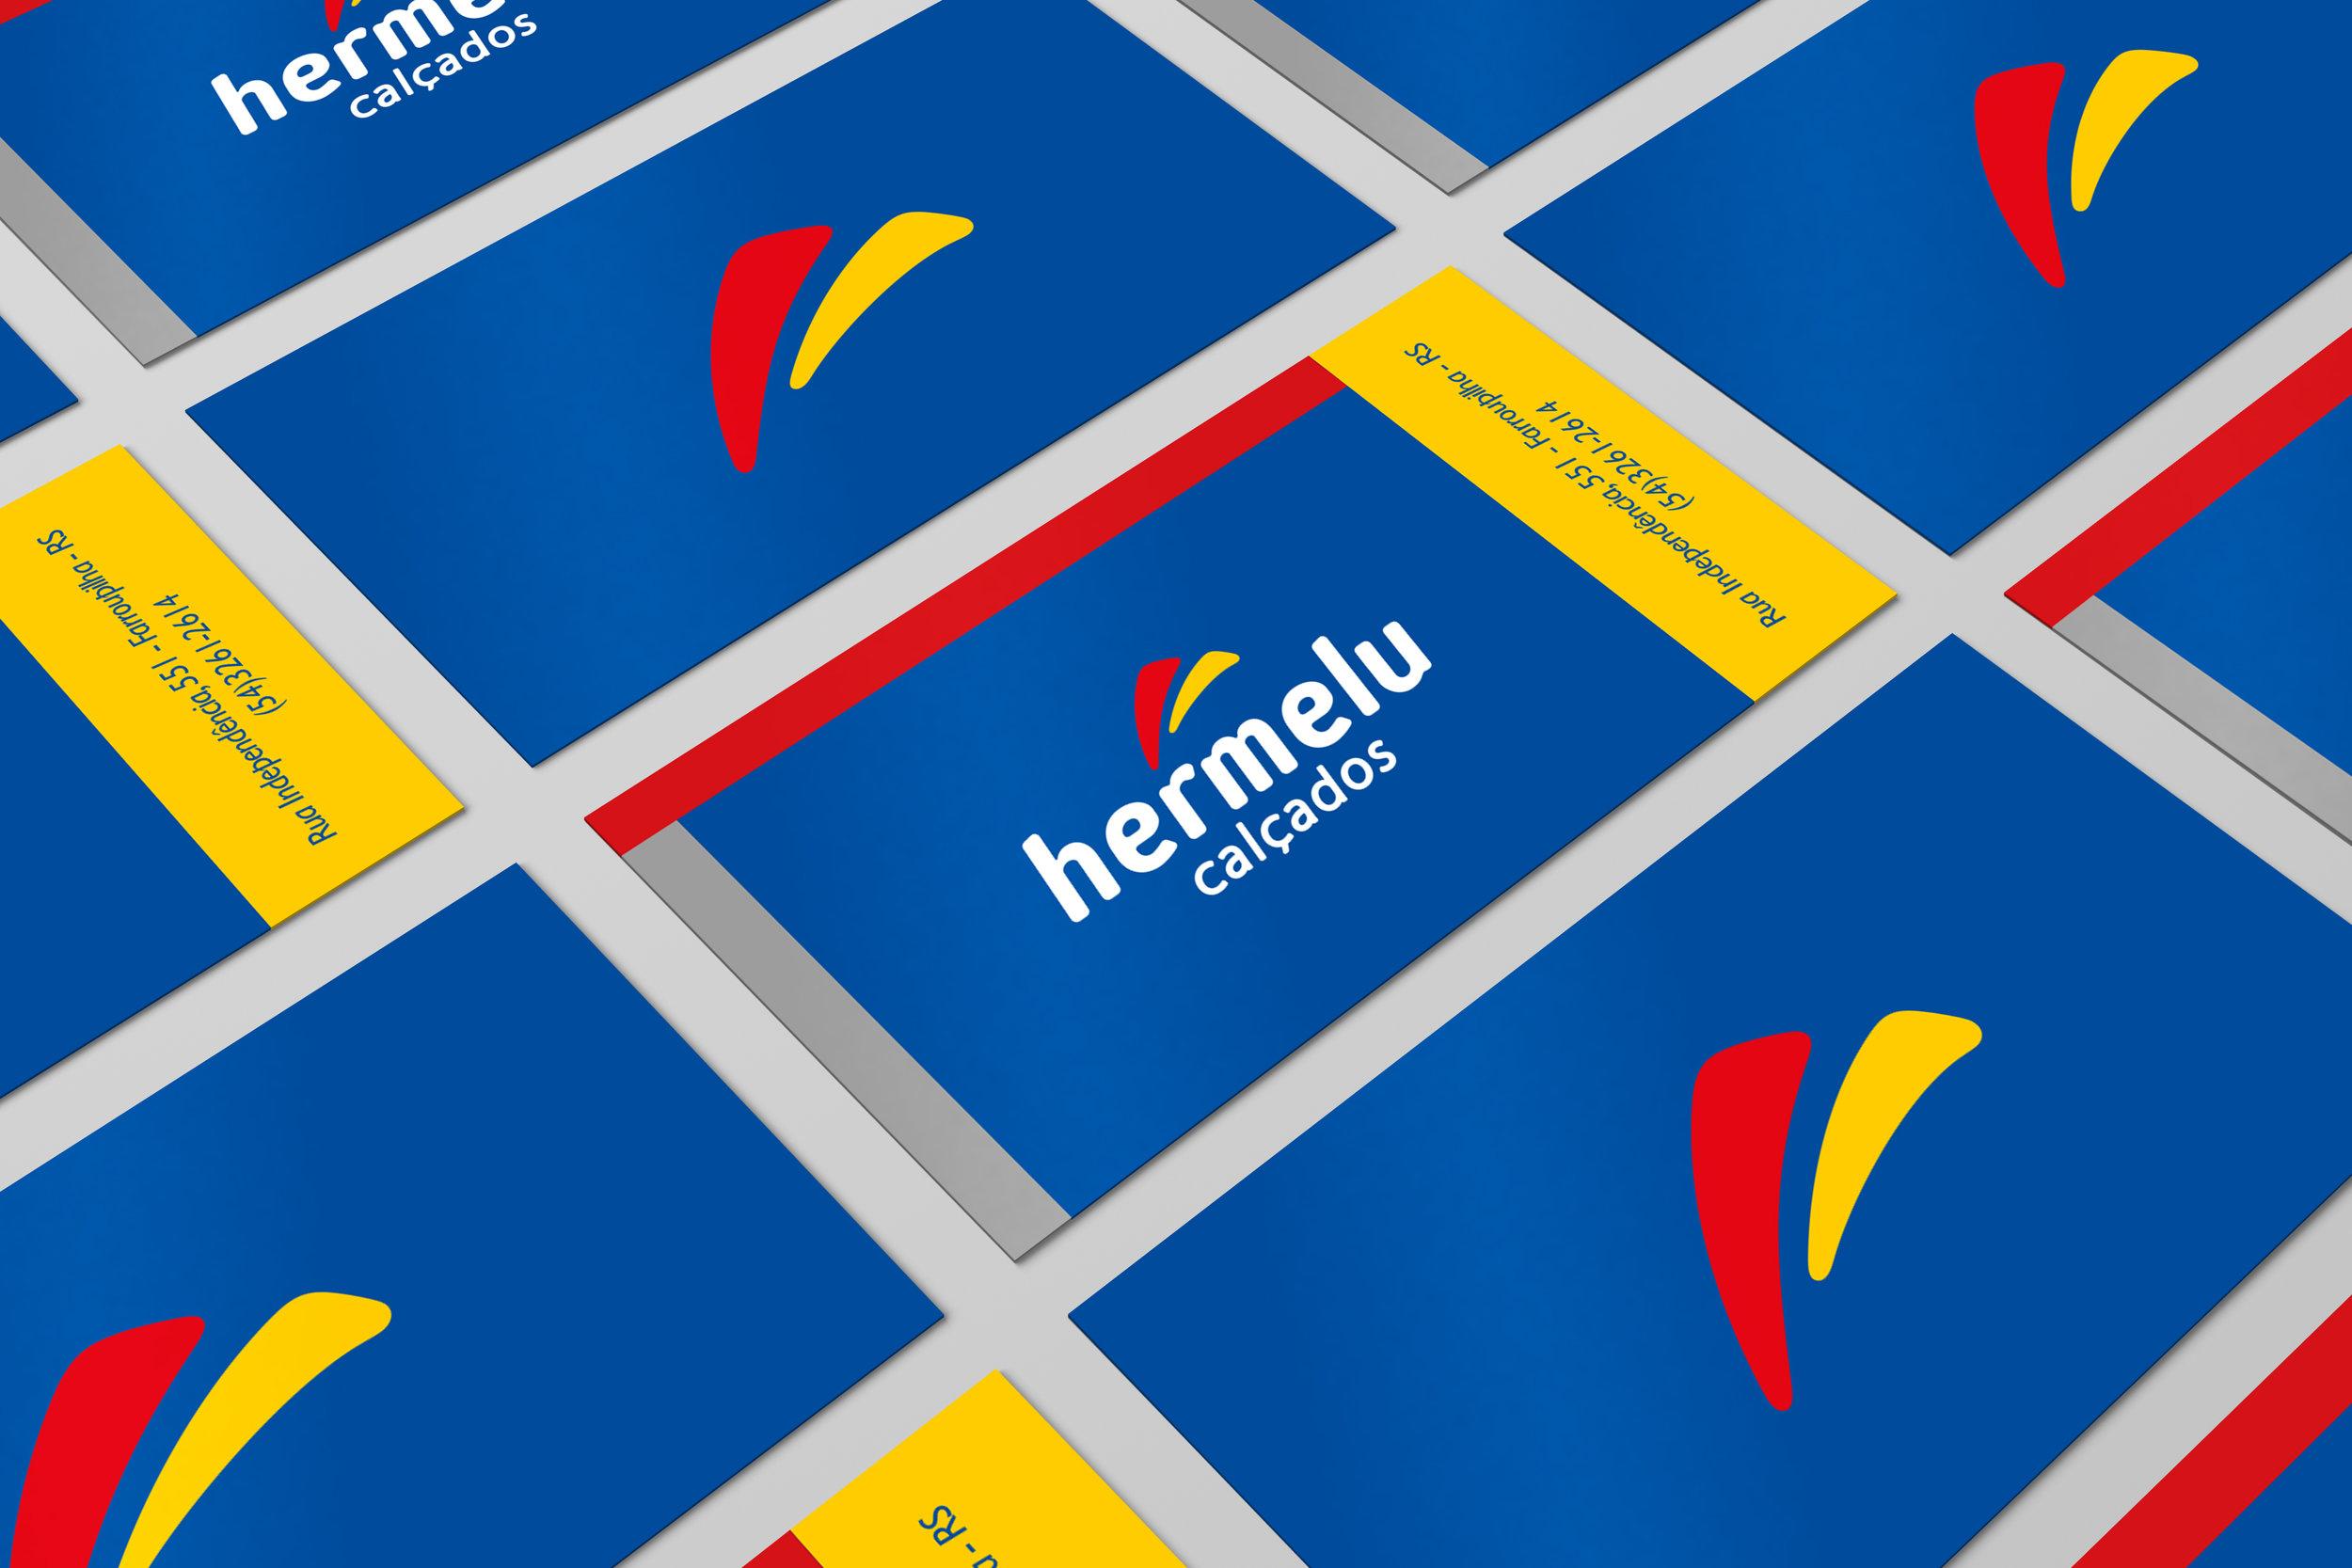 business card mockup_3_HERM.jpg